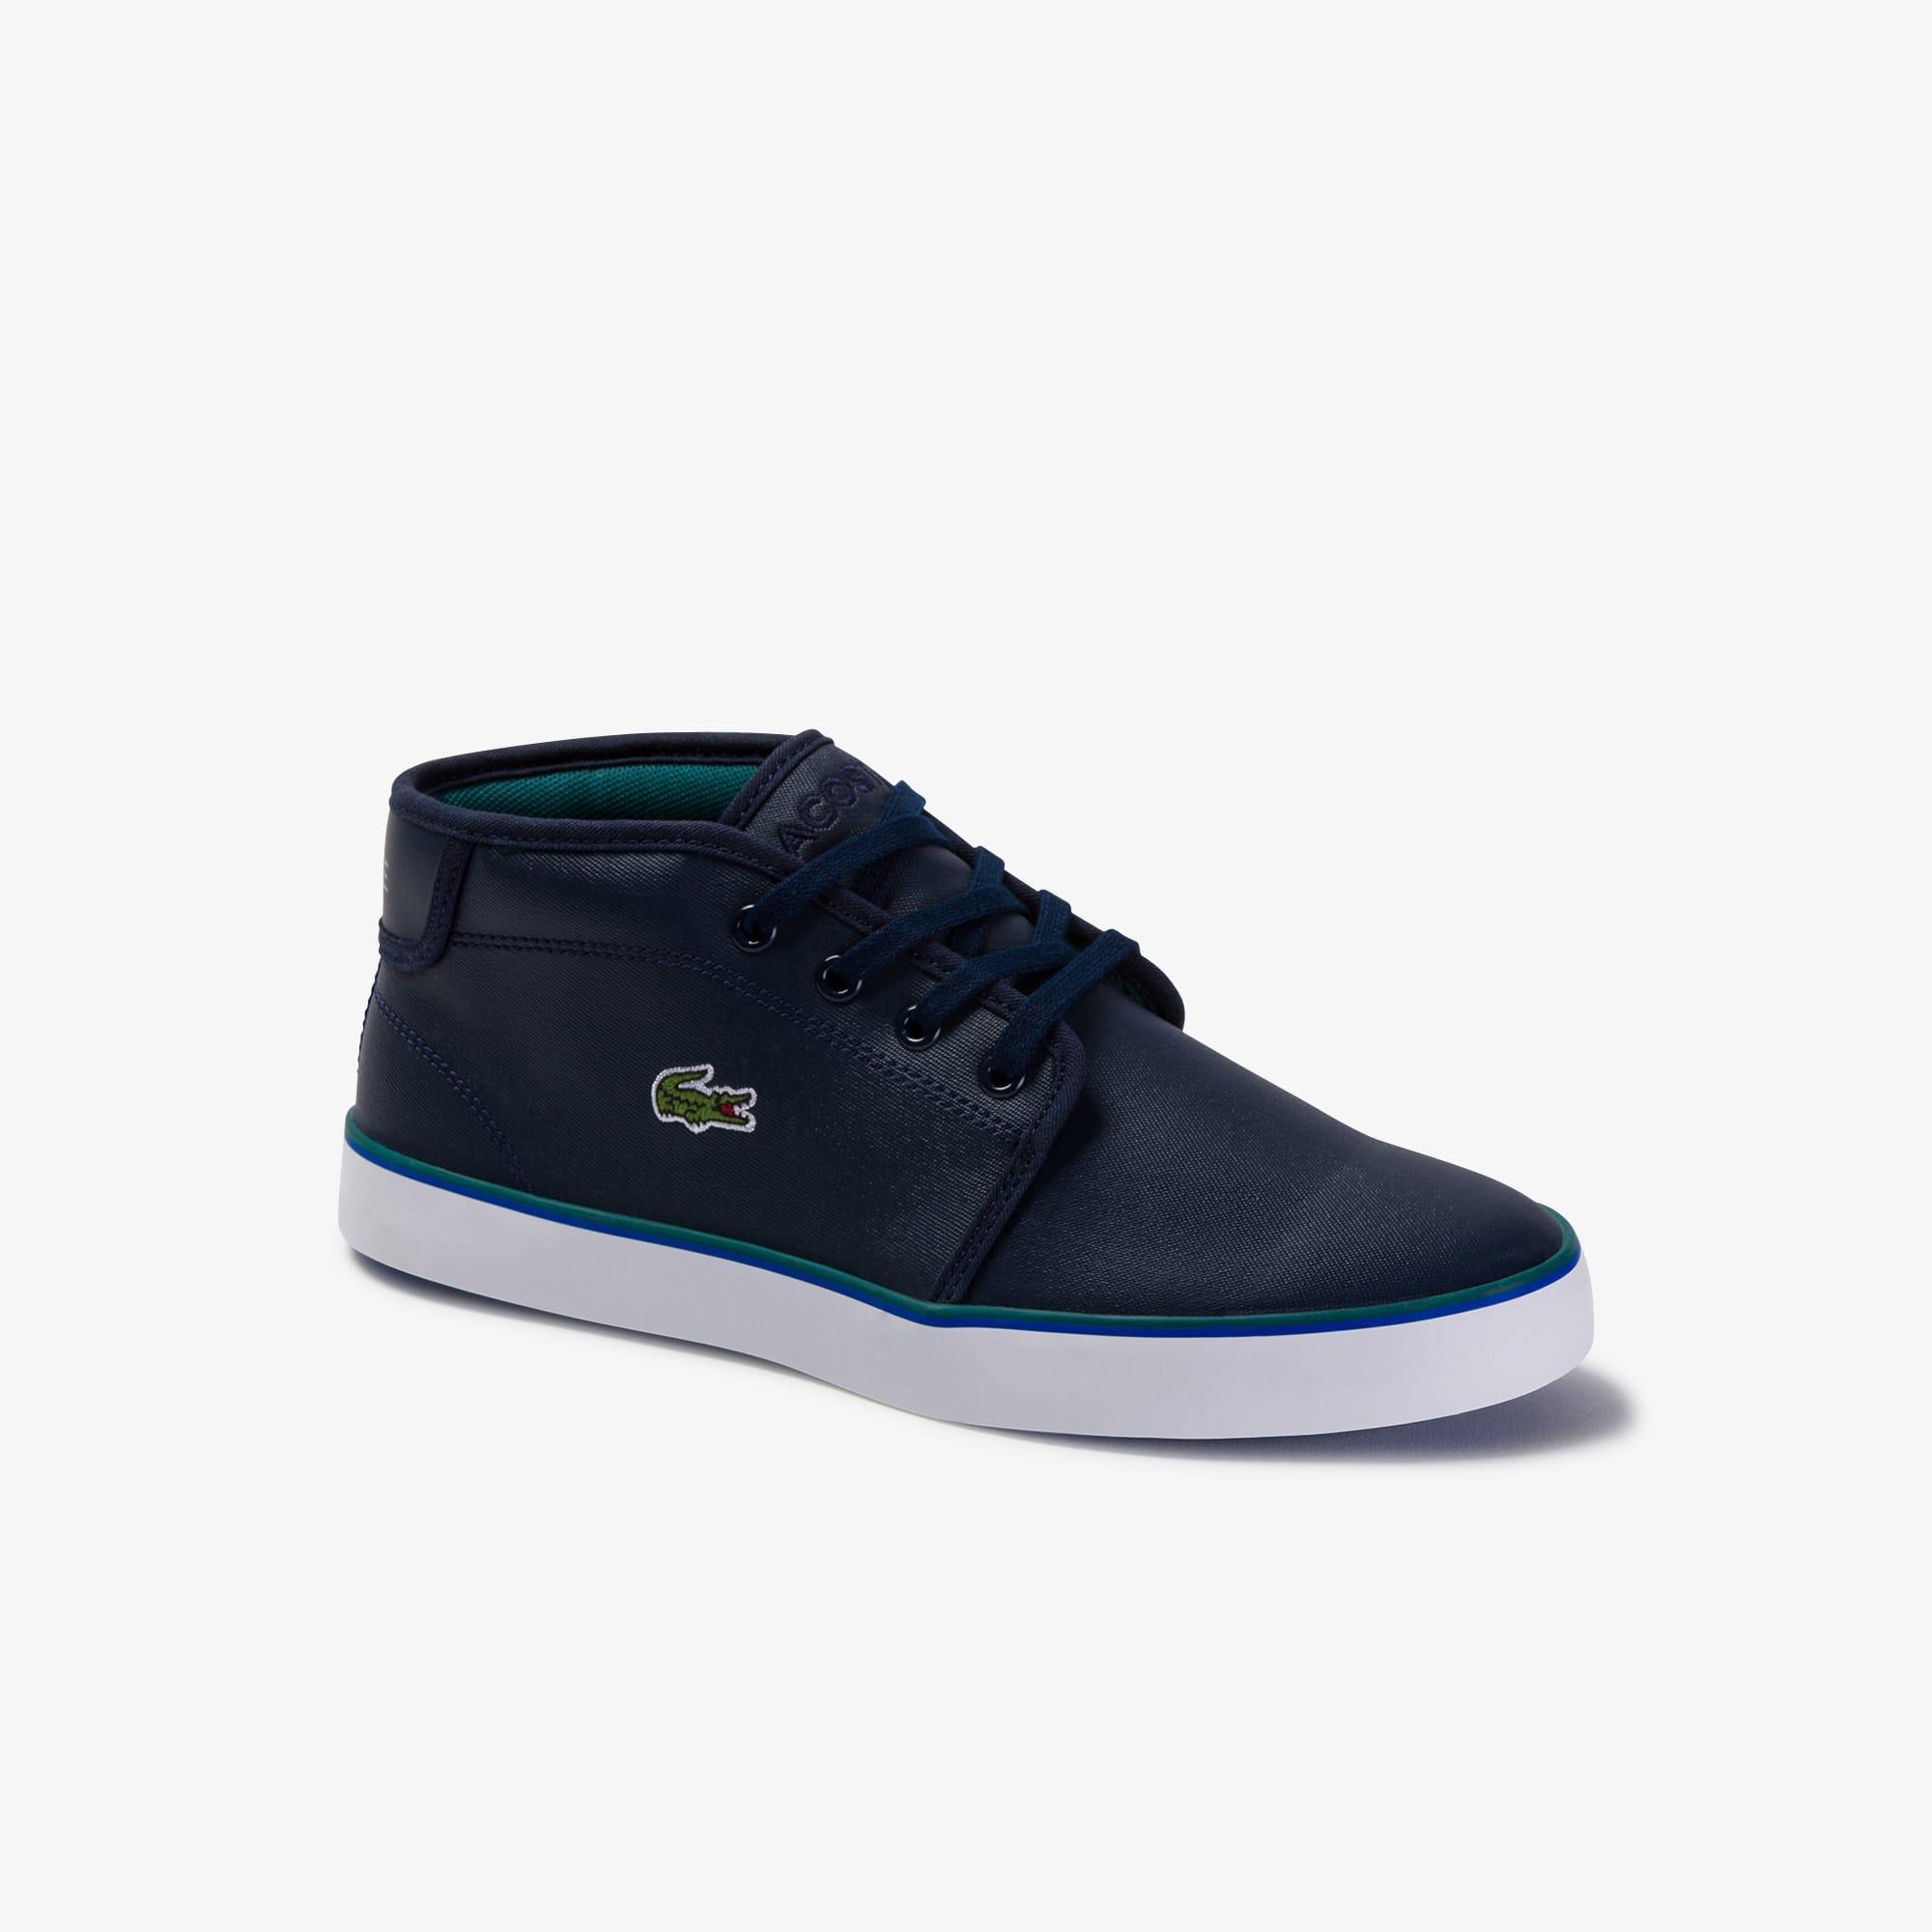 Boy's collection | Kids Footwear | LACOSTE